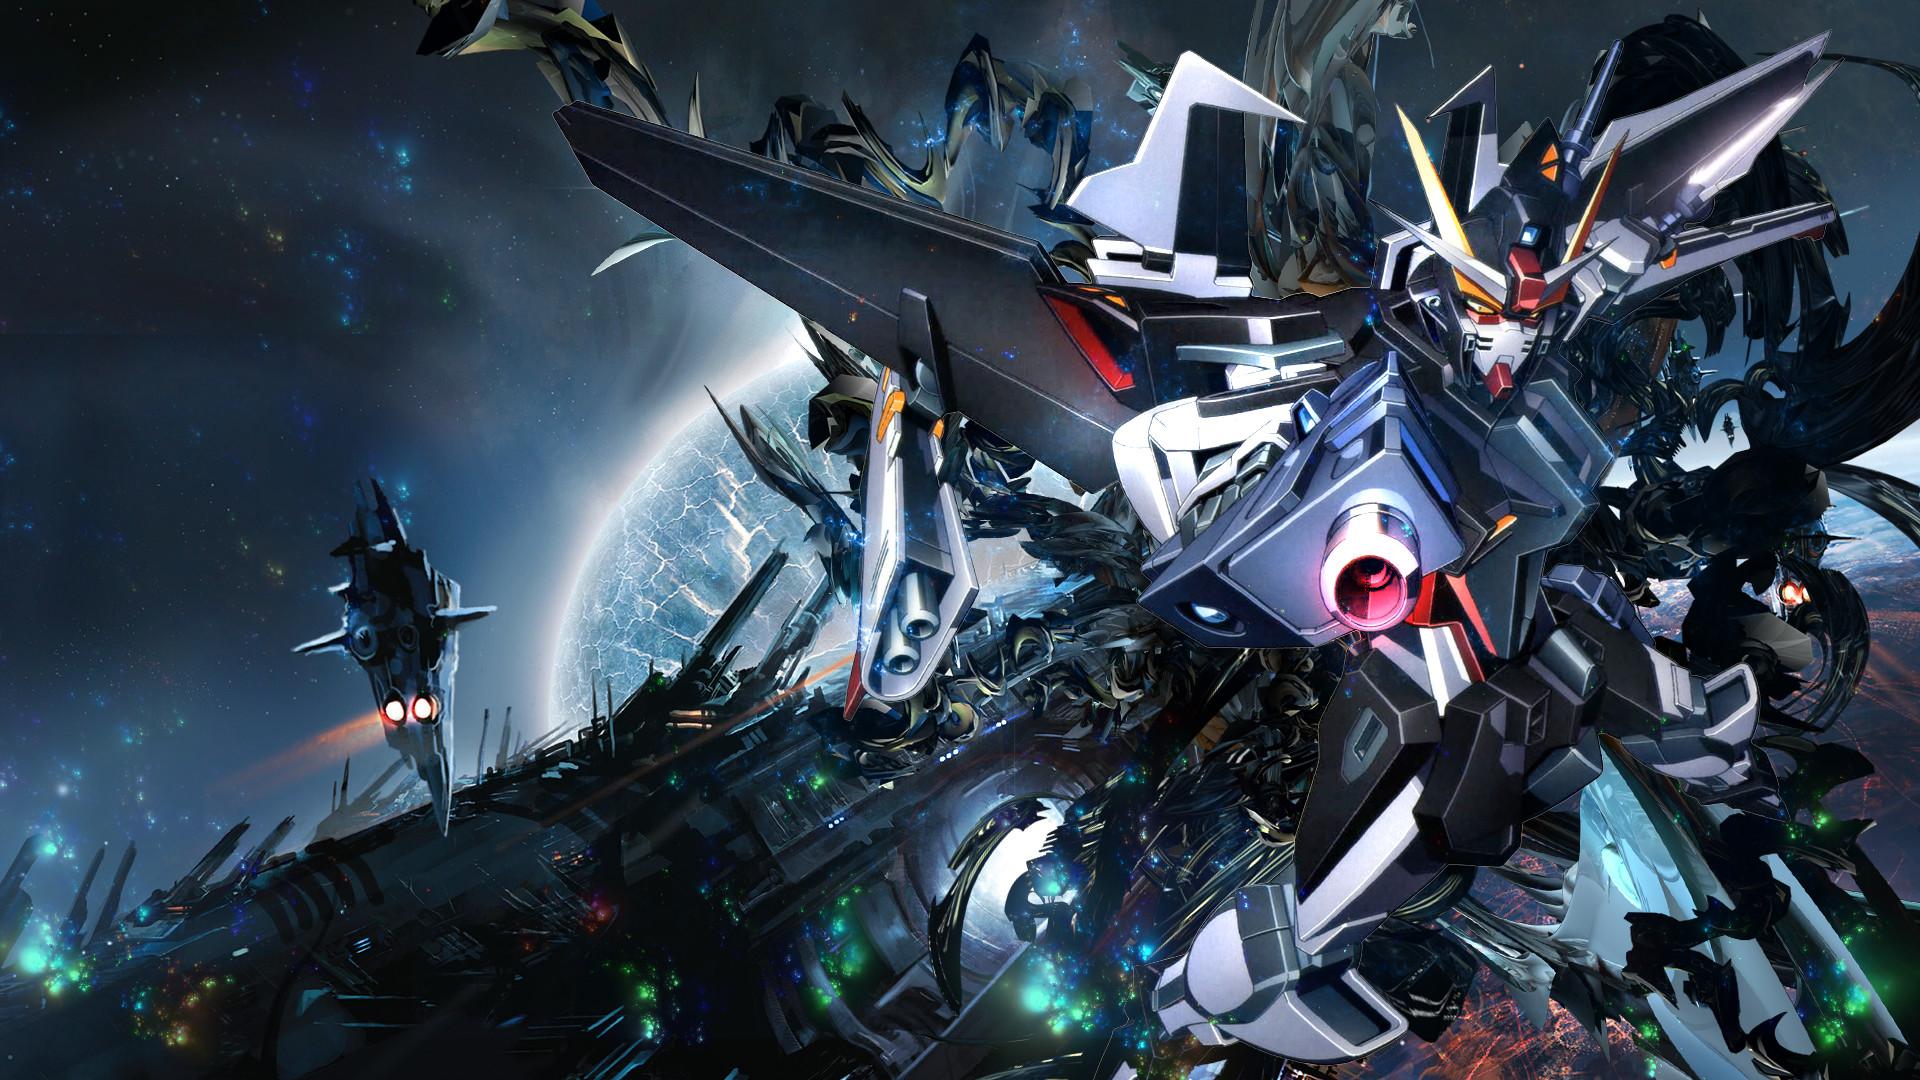 Gundam Hd Wallpapers 64 Images